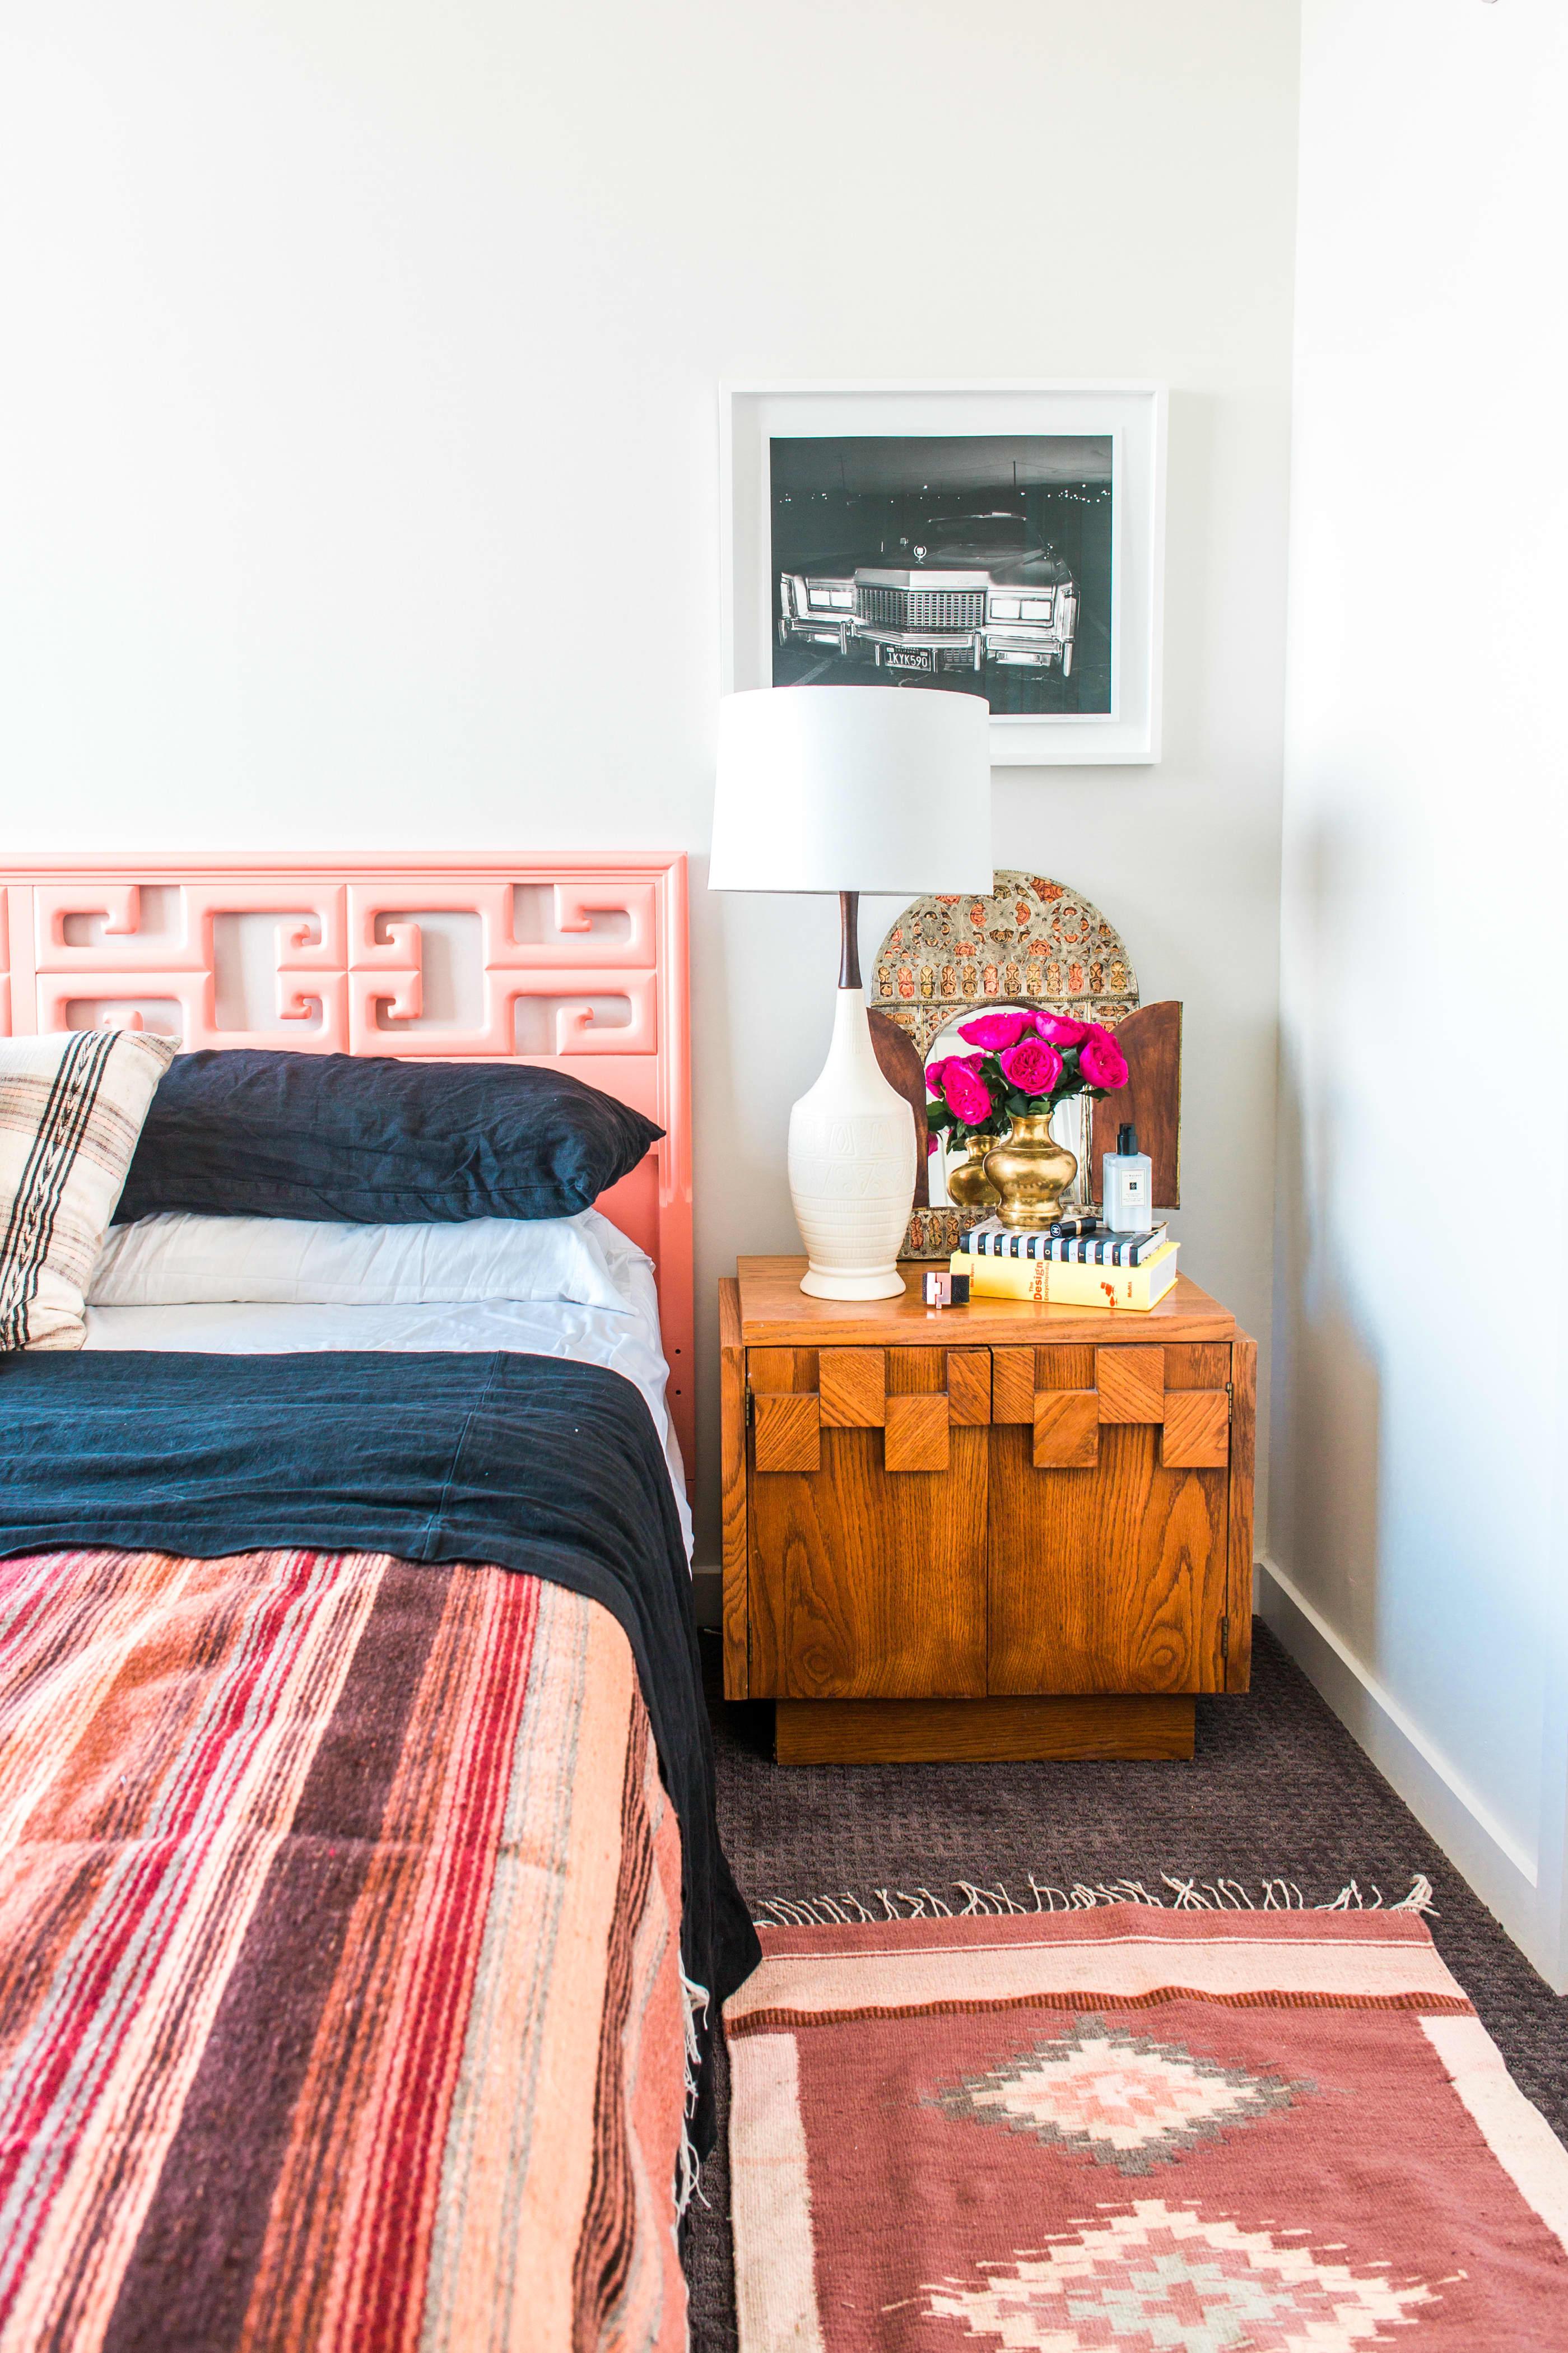 House Tour: A Bold, Kitschy & Classic Austin Apartment